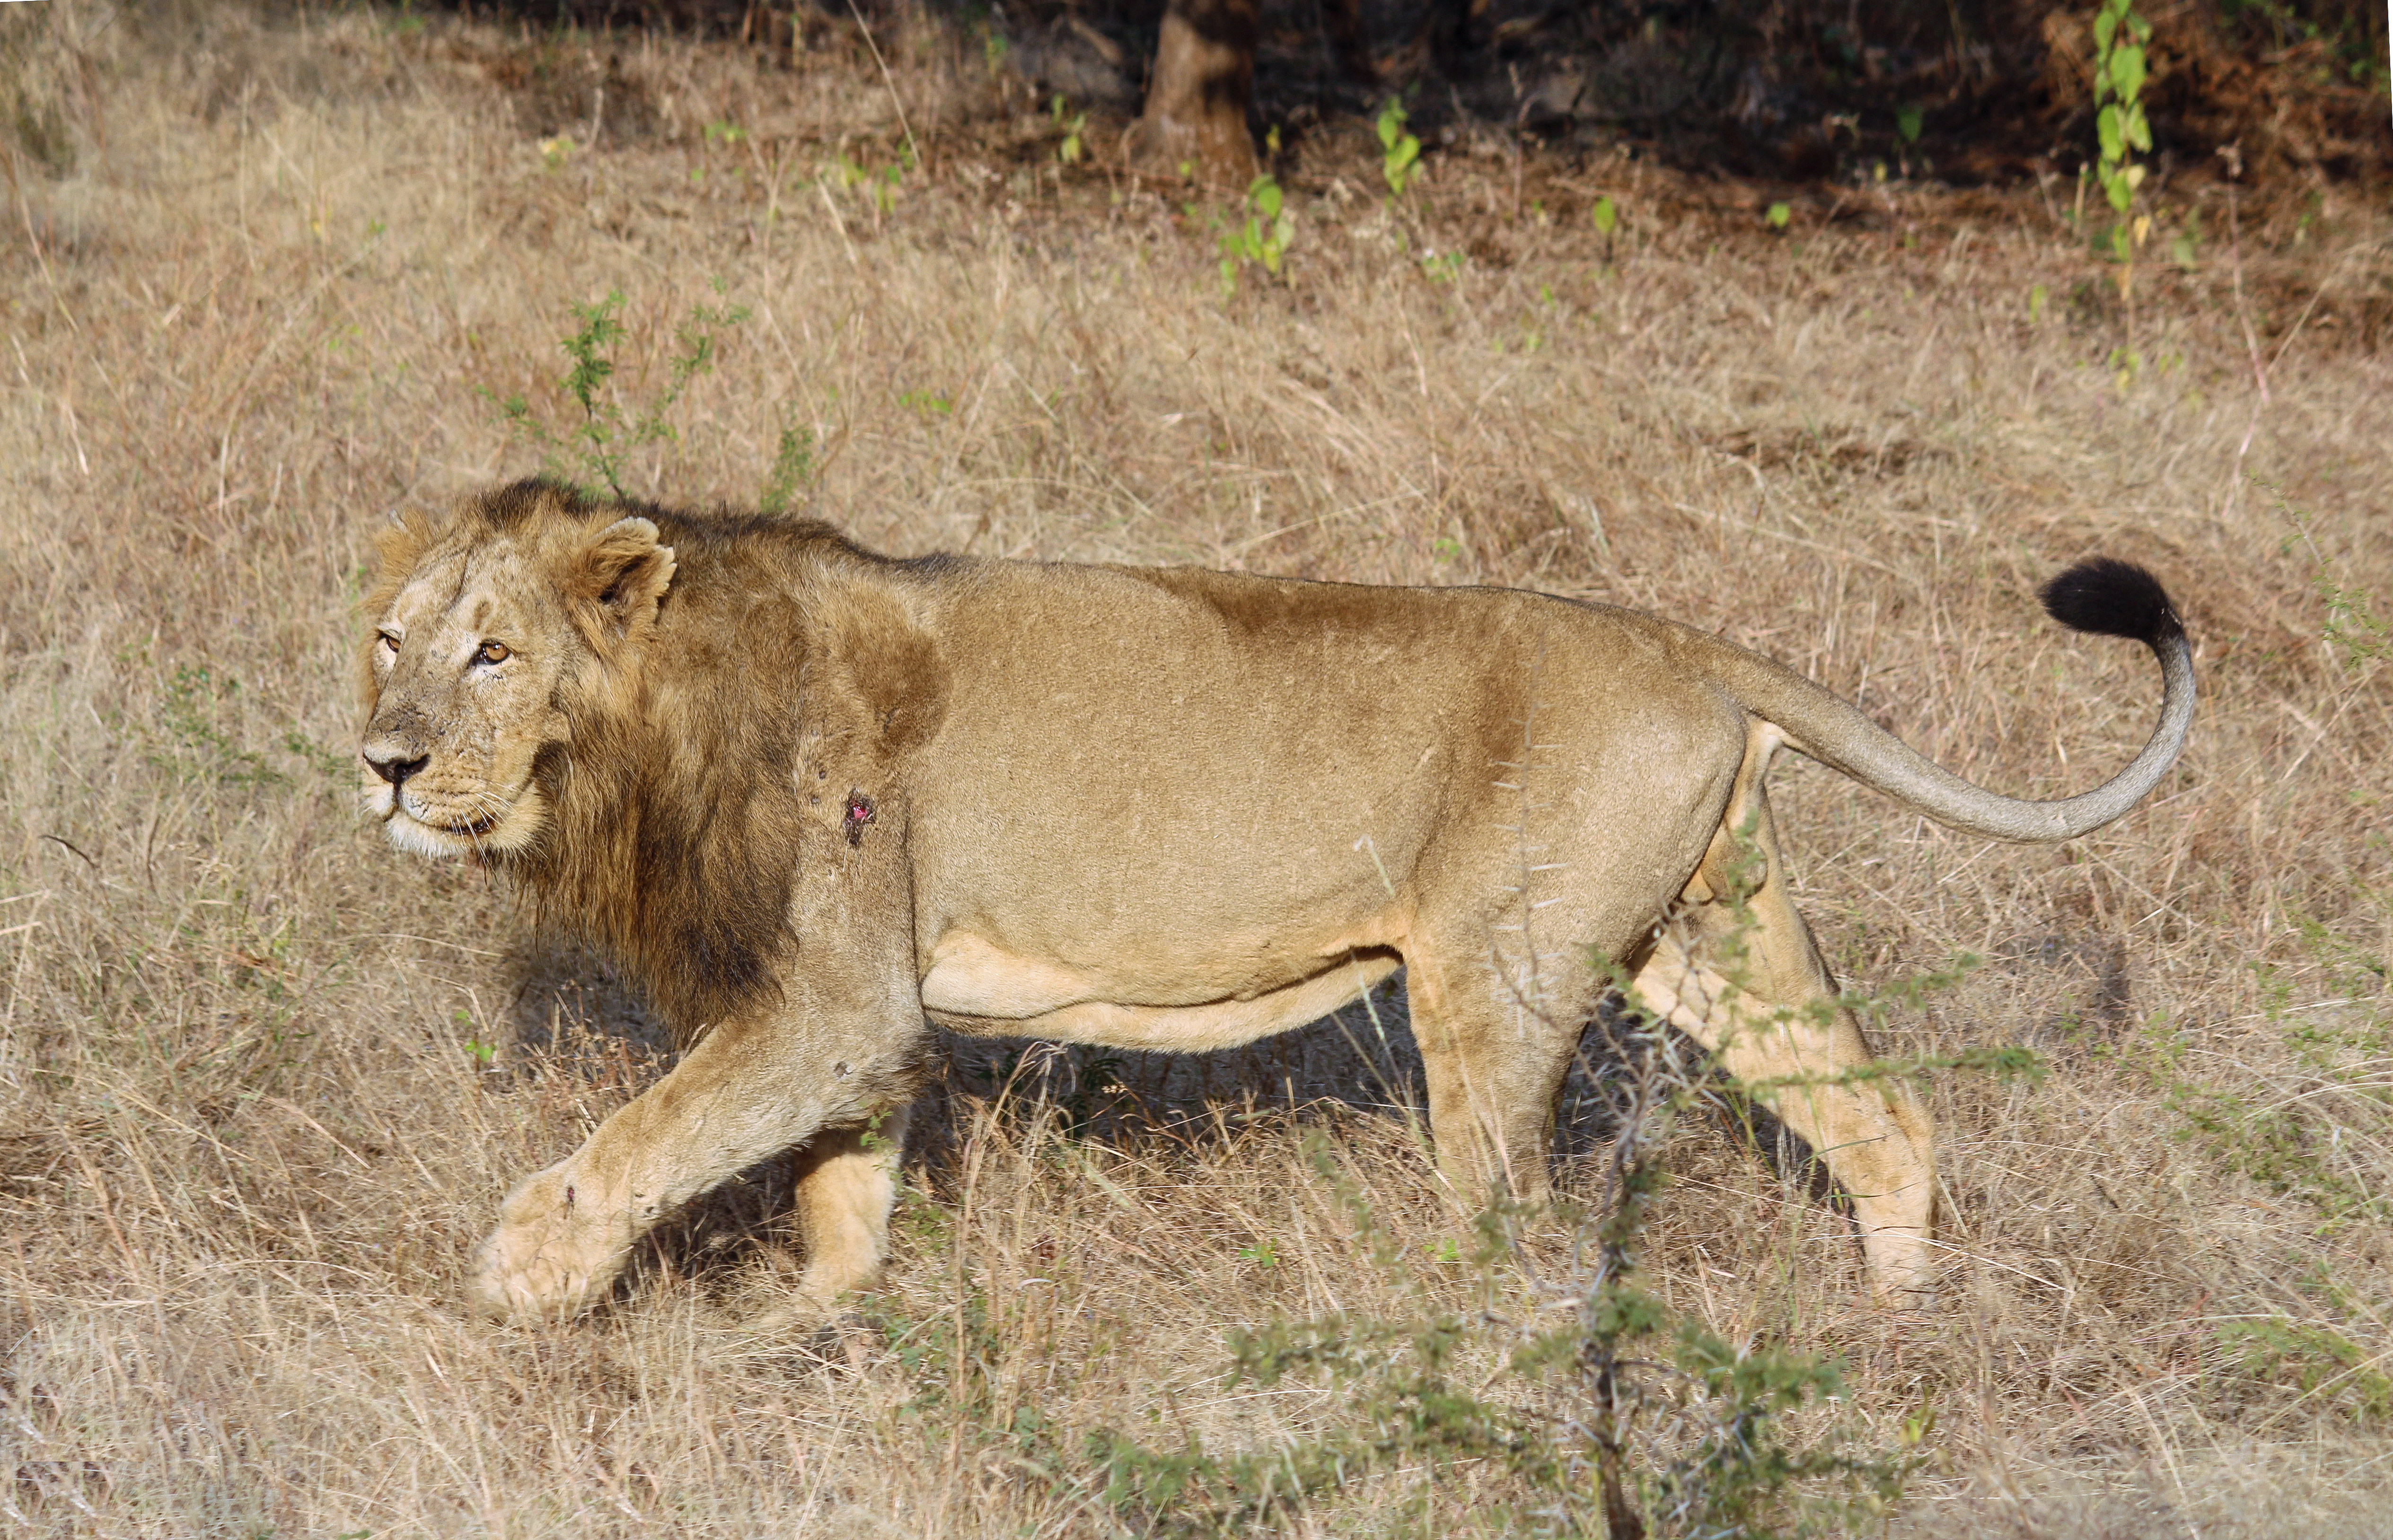 File:Asiatic lion 03.jpg - Wikimedia Commons